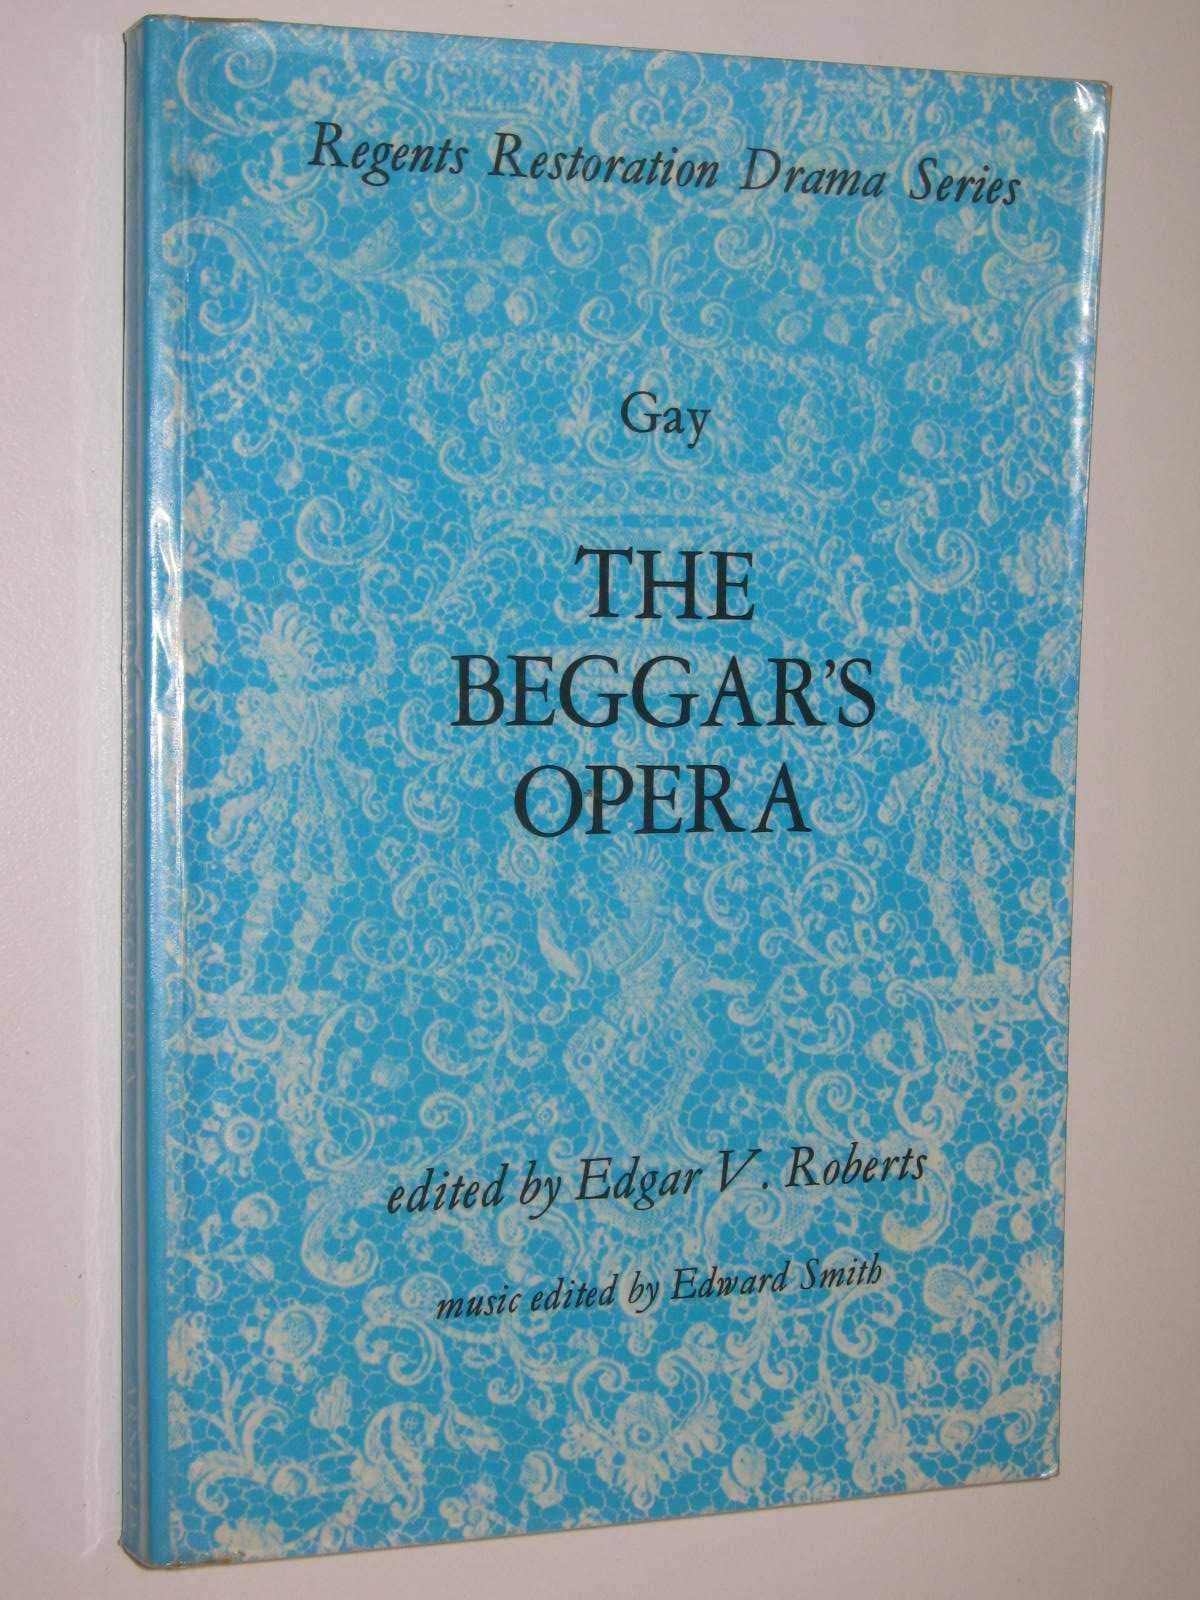 Image for The Beggar's Opera - Regents Restoration Drama Series Series